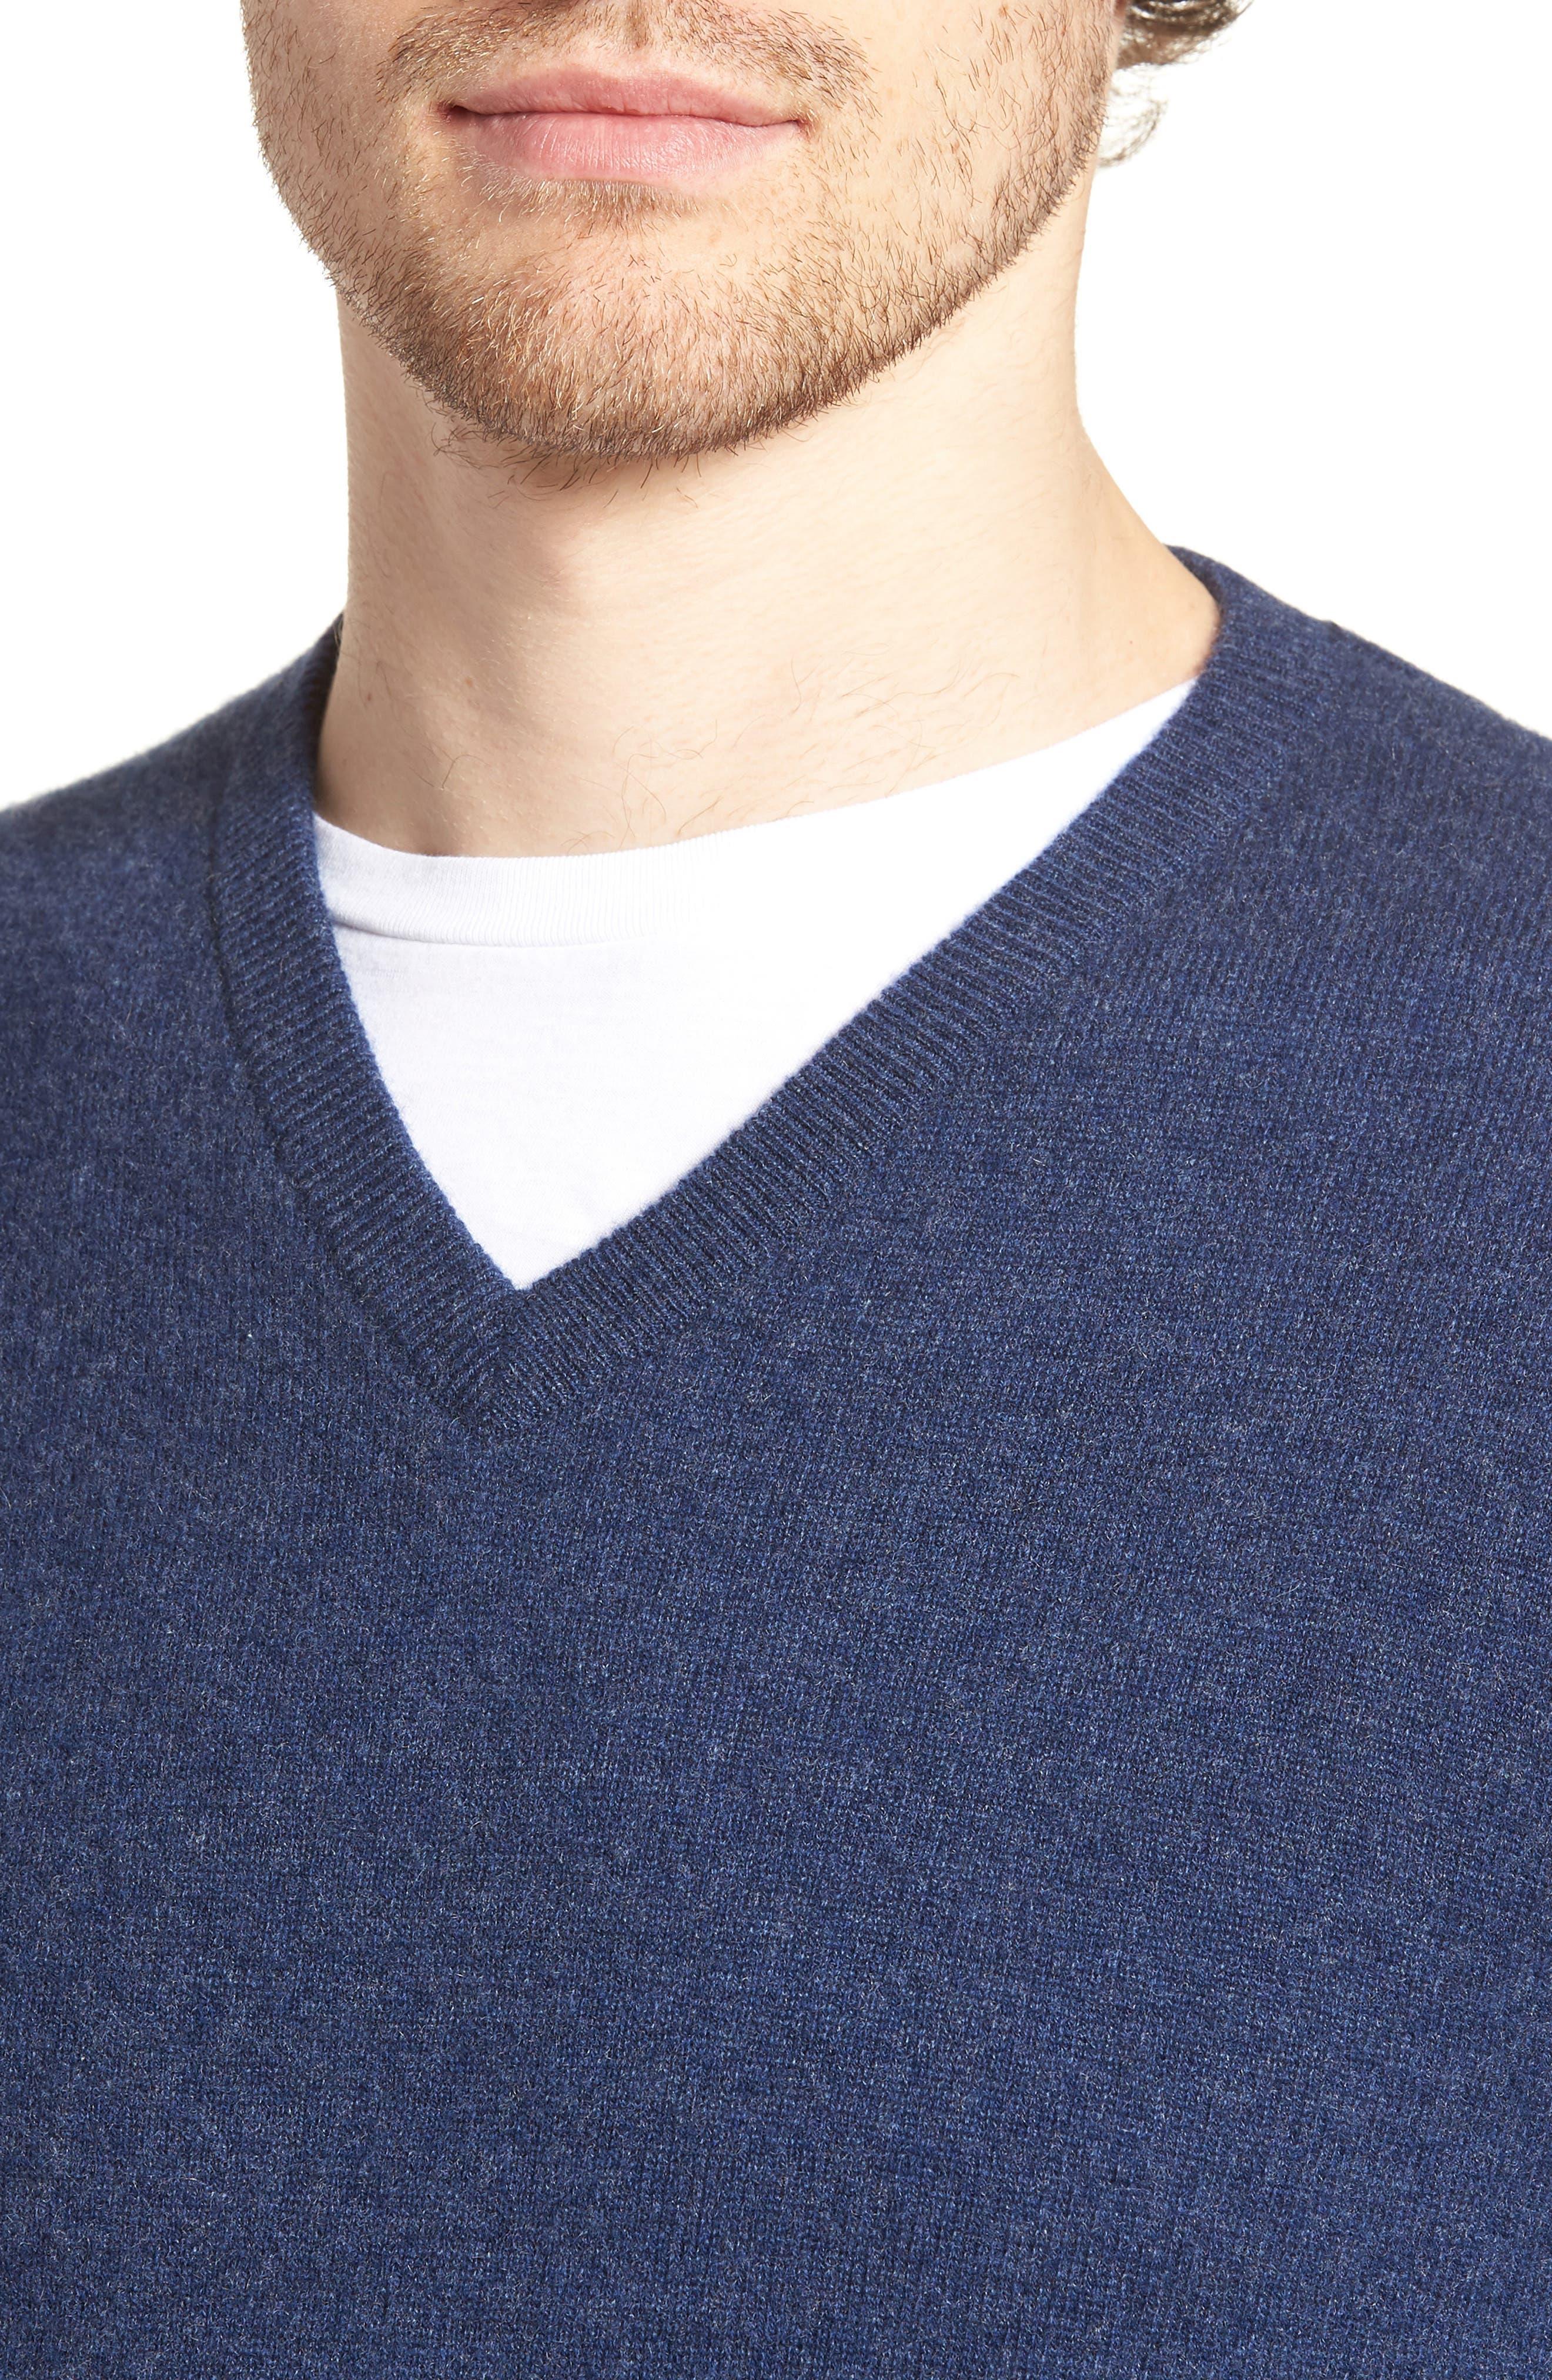 Cashmere V-Neck Sweater,                             Alternate thumbnail 4, color,                             BLUE ESTATE HEATHER